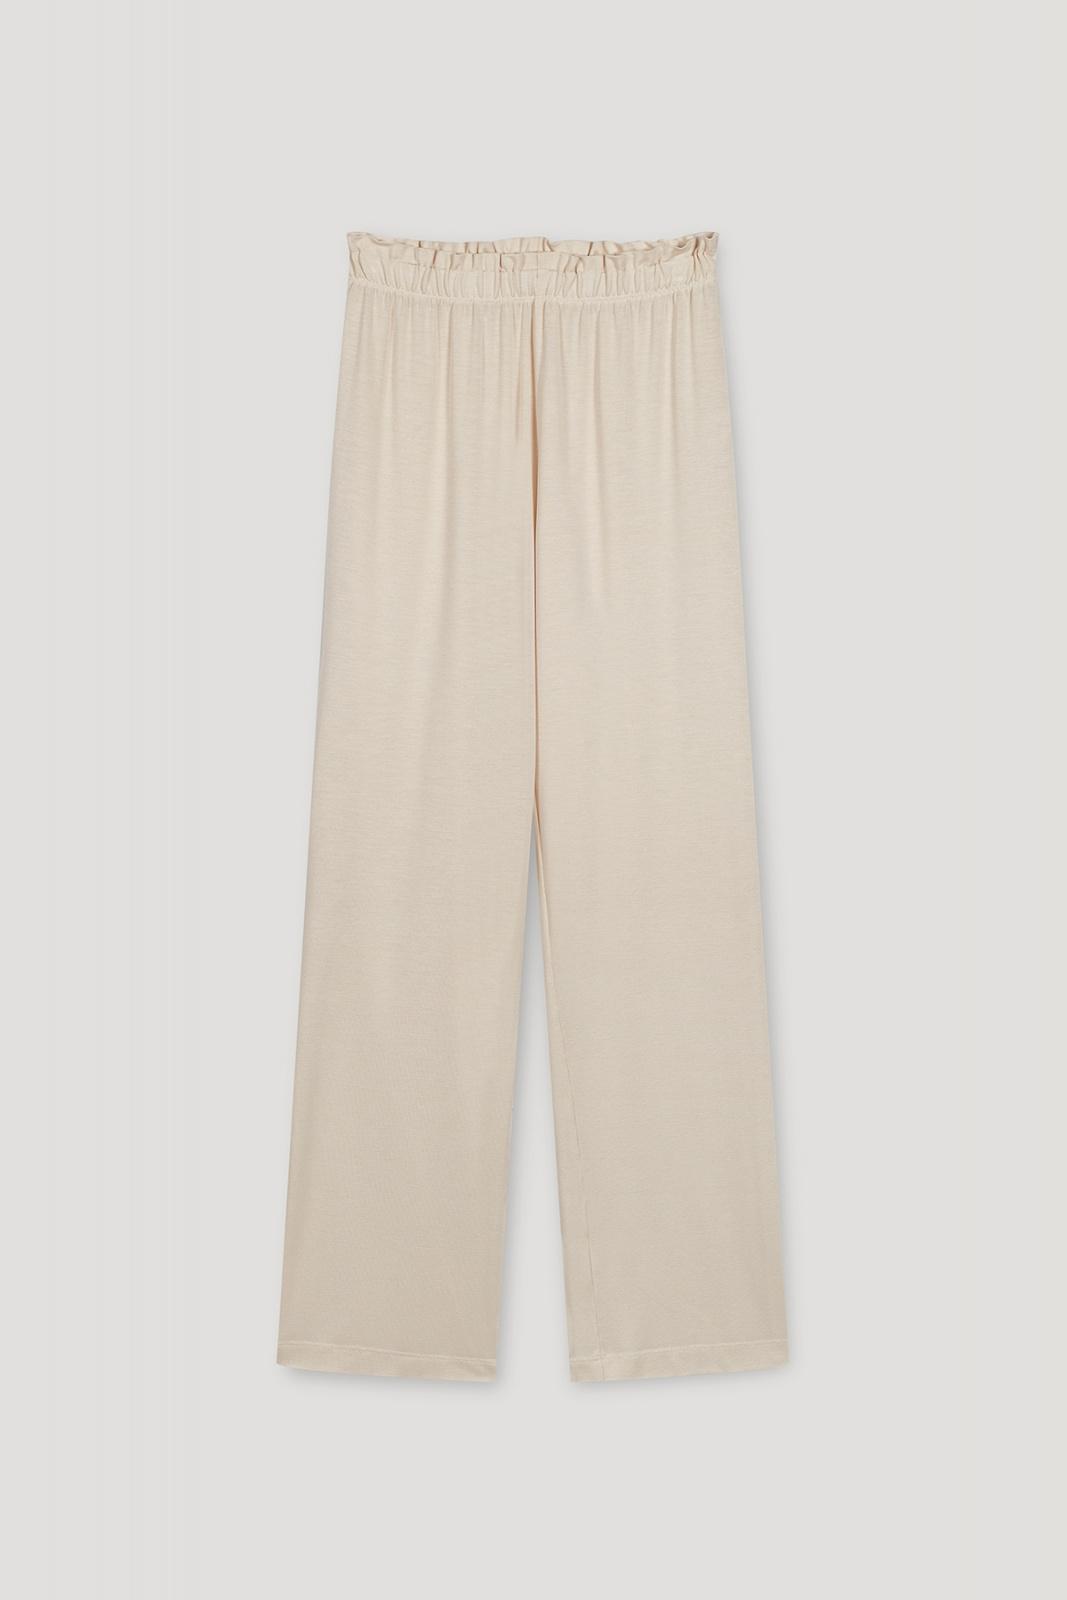 Chance Pants Pants, shorts Elementy